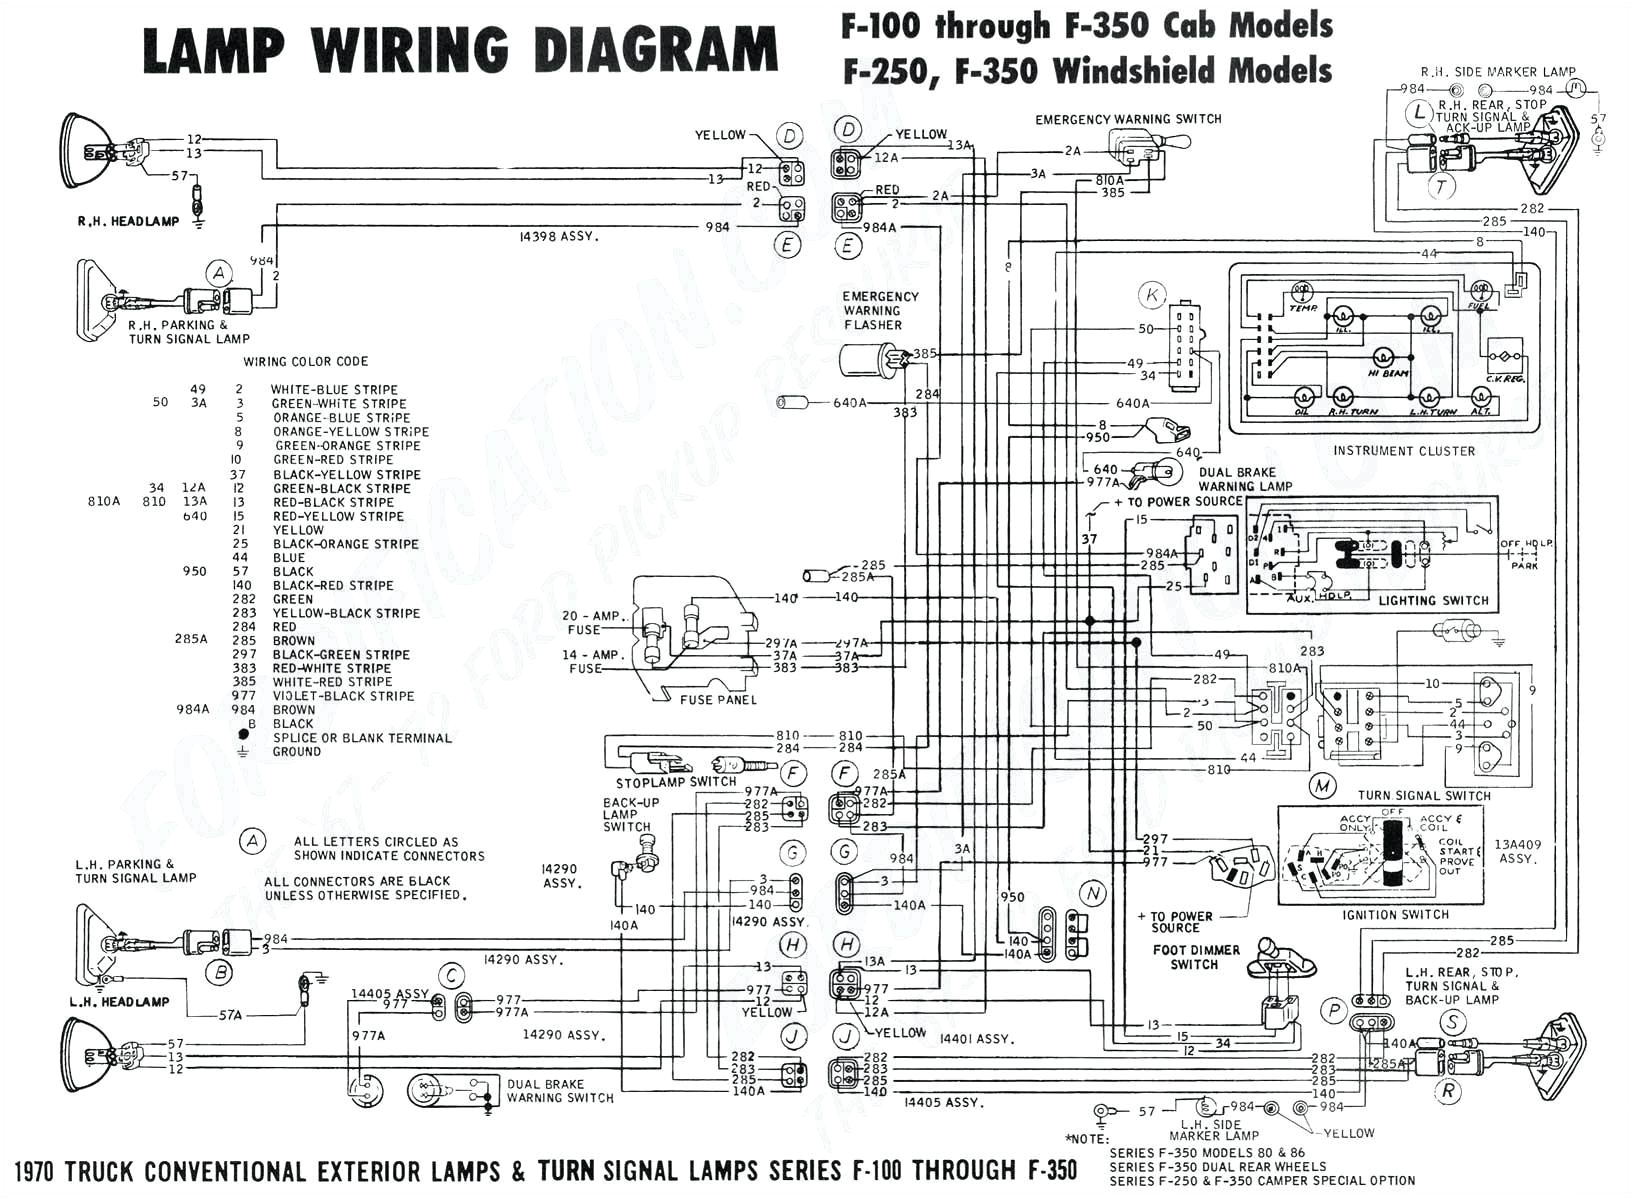 1988 corvette fuse panel diagram wiring diagram operations 1988 chevy truck fuse box